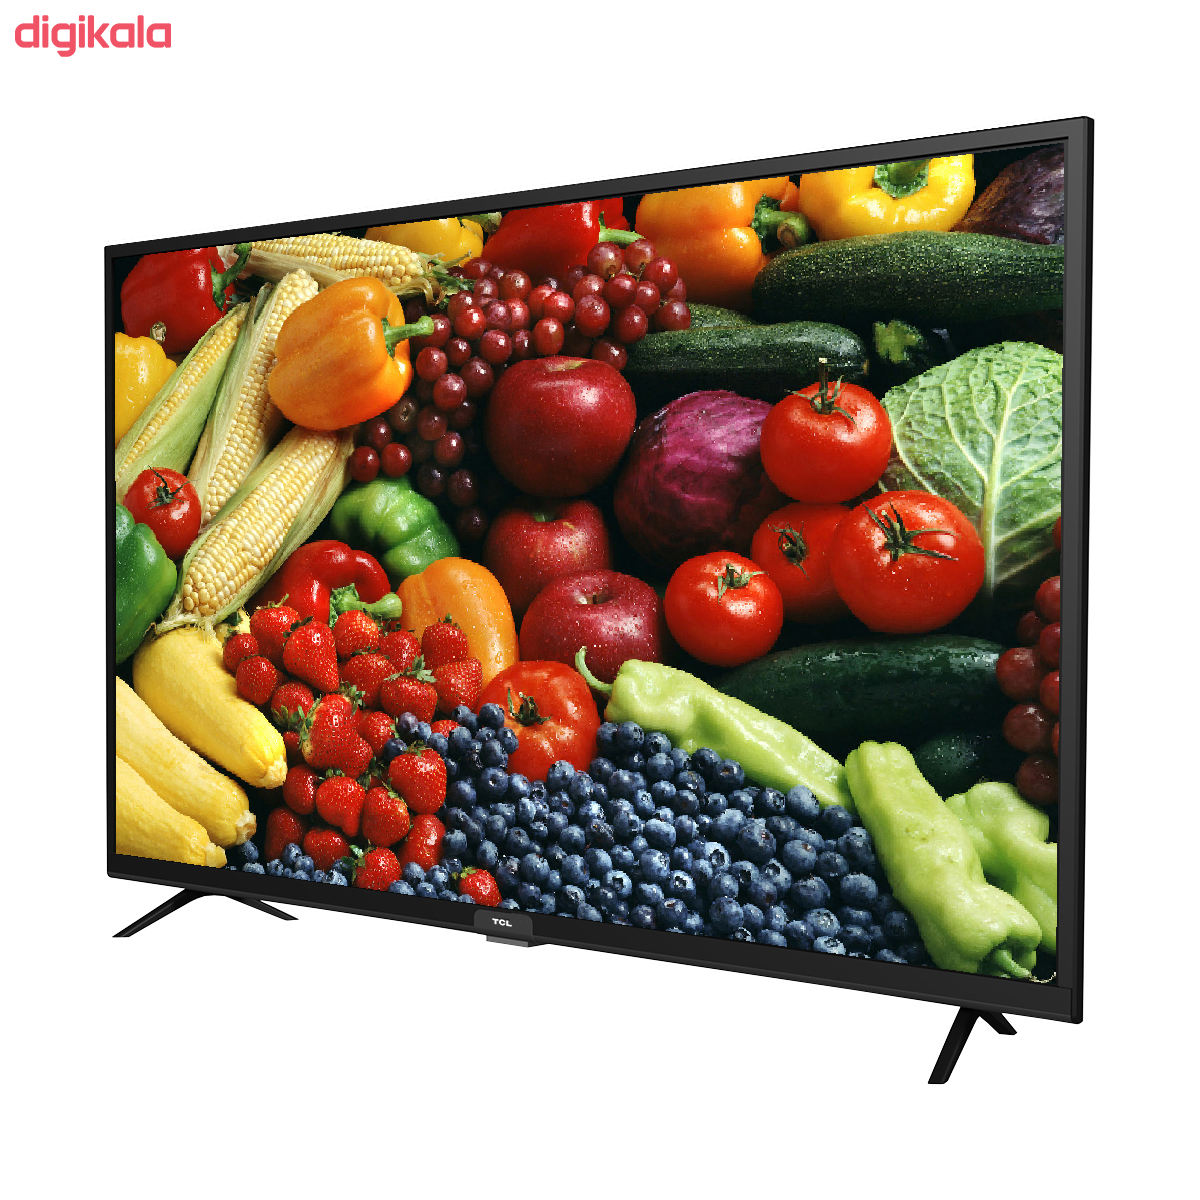 تلویزیون ال ای دی هوشمند تی سی ال مدل 43S6510 سایز 43 اینچ main 1 2